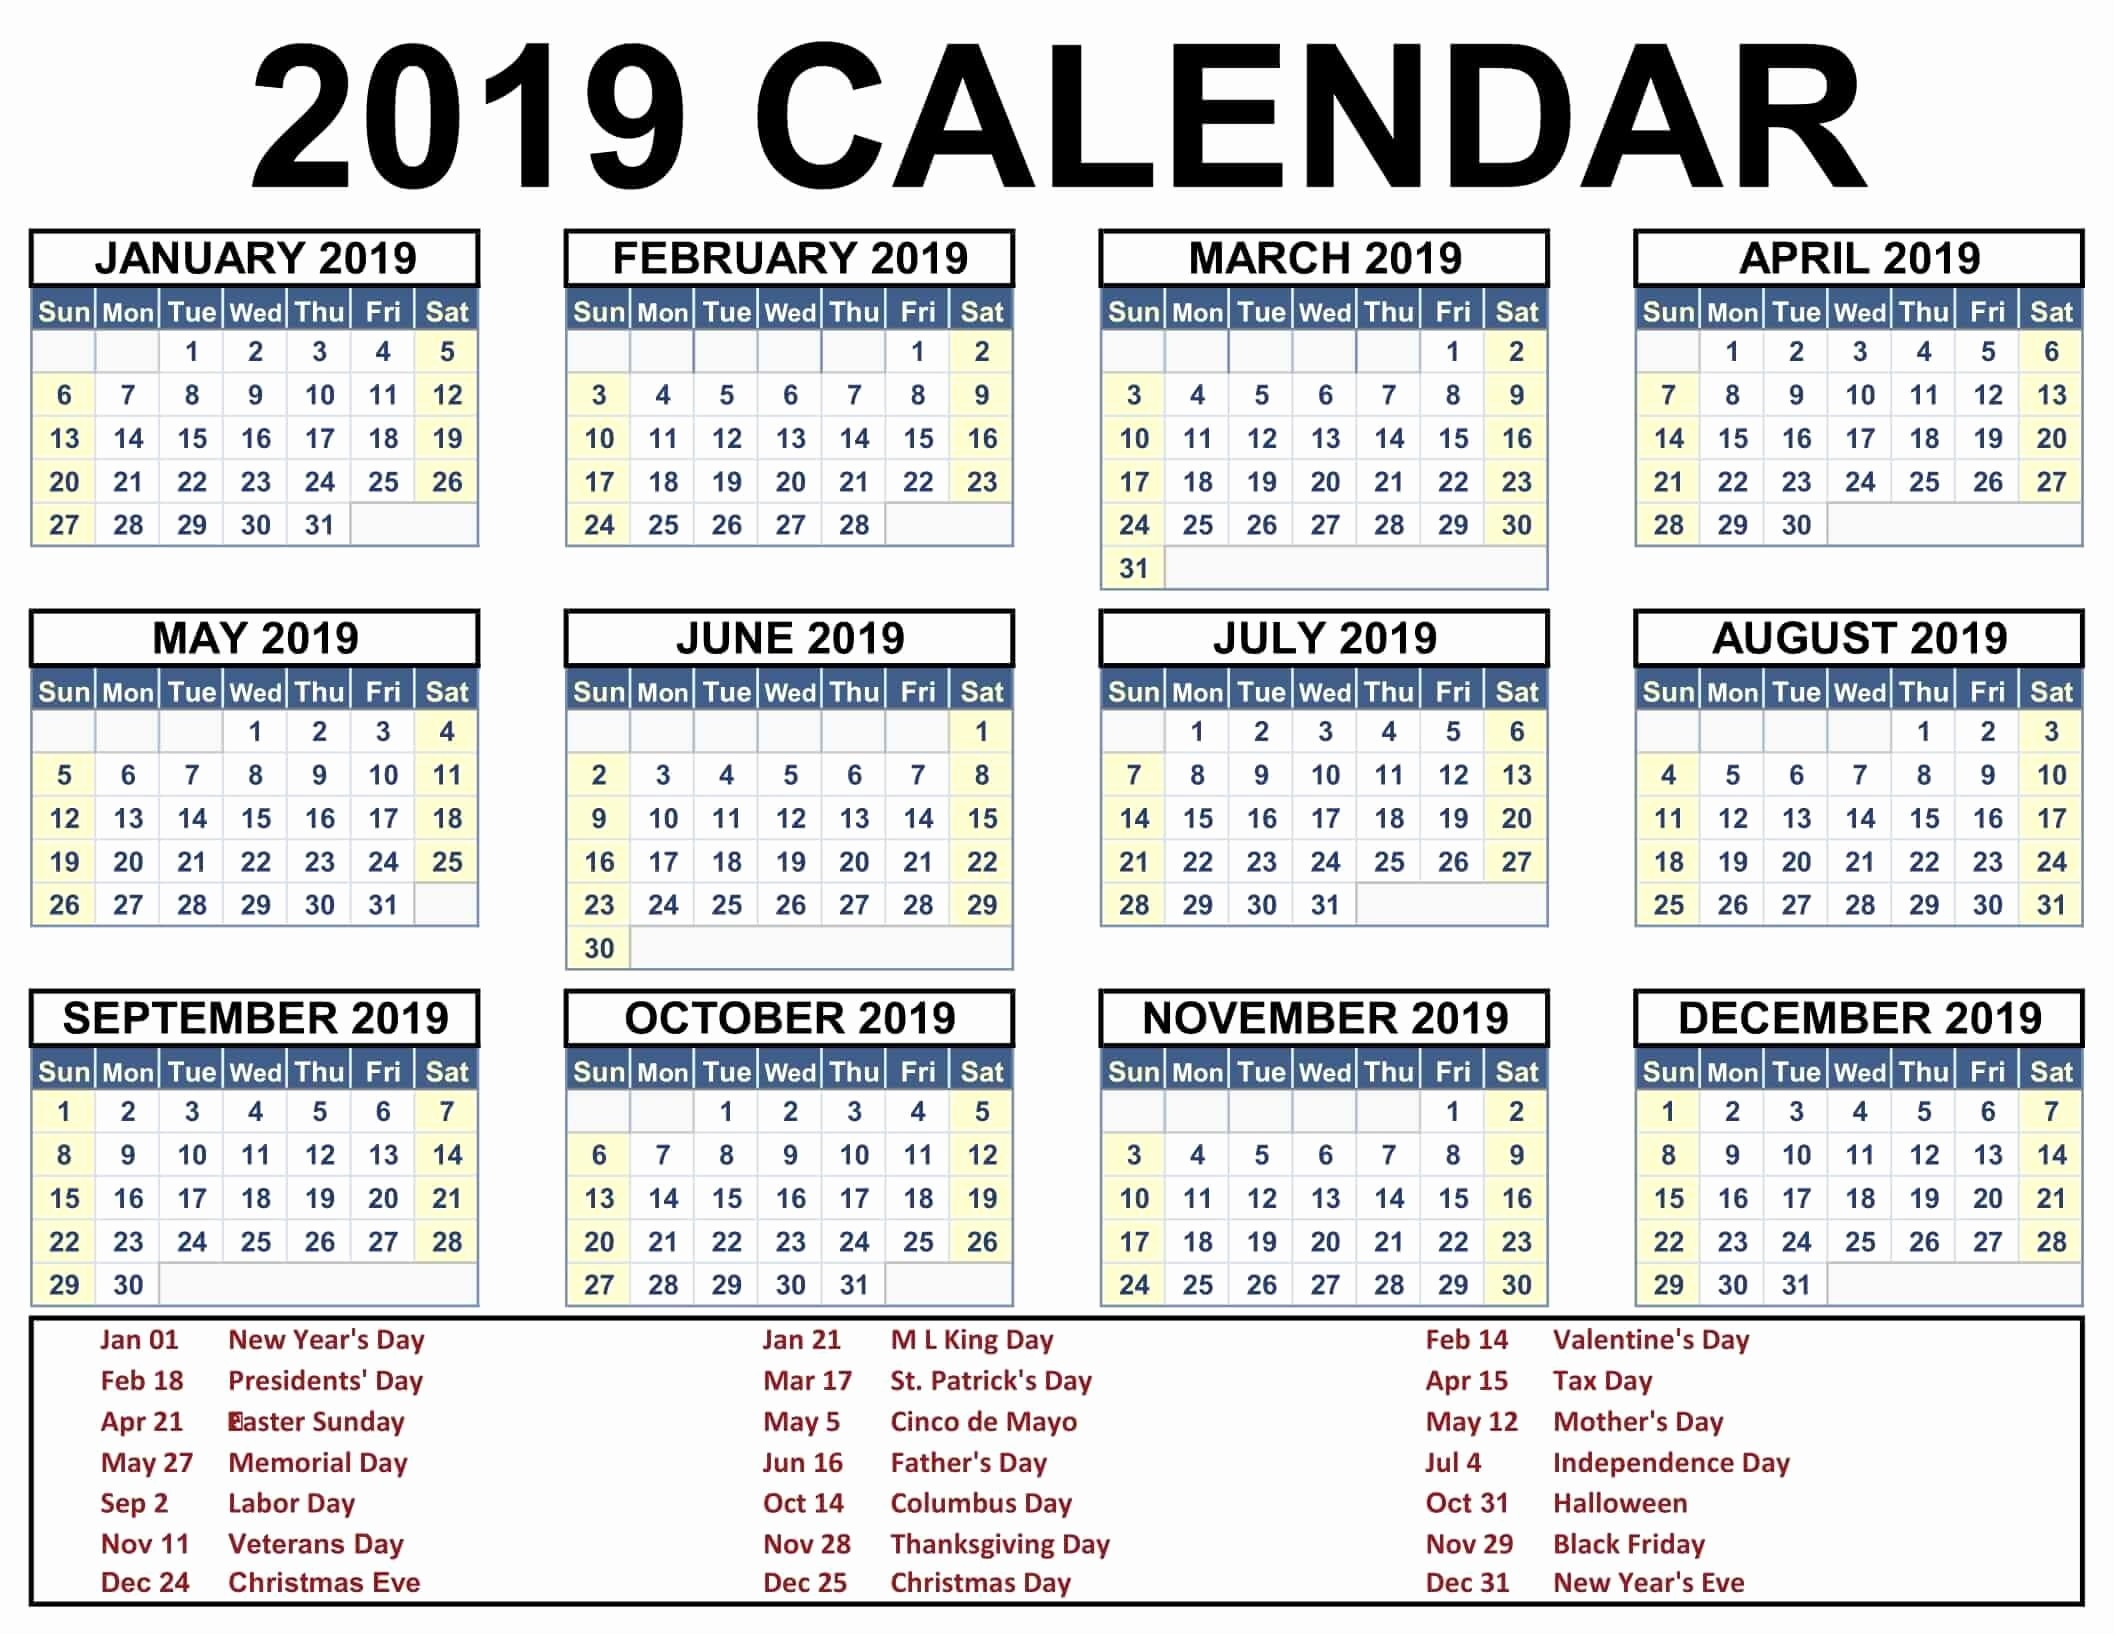 Luxury 32 Examples Hanukkah 2019 2020 Calendar | Etxettipia-Calendar With Jewish Holidays 2020